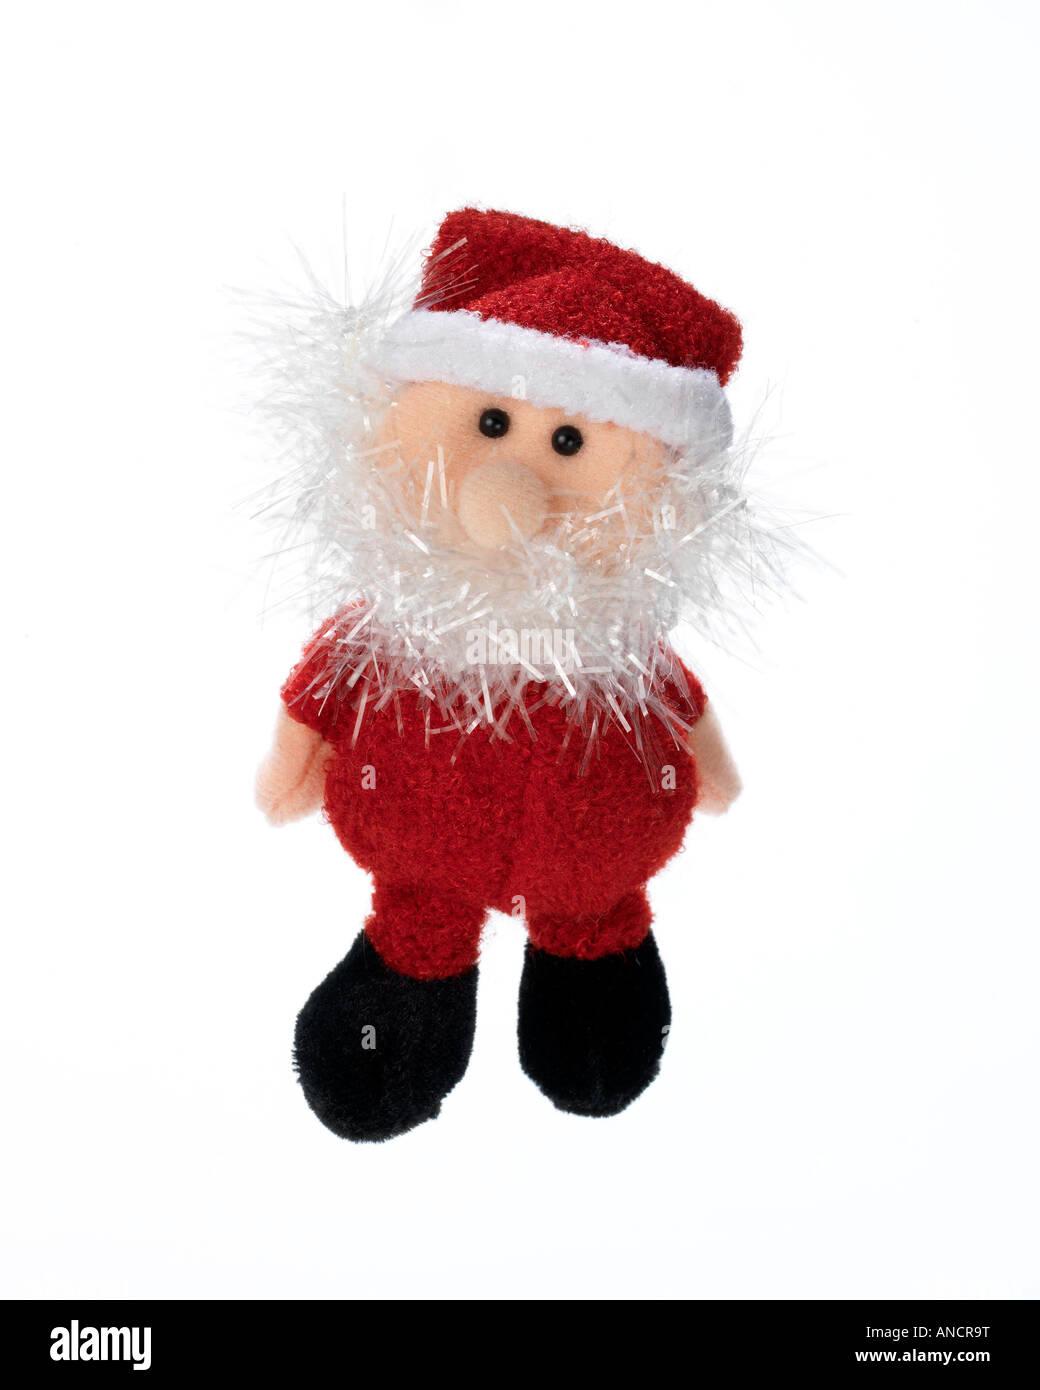 Santa Claus Christmas decoration on white background - Stock Image